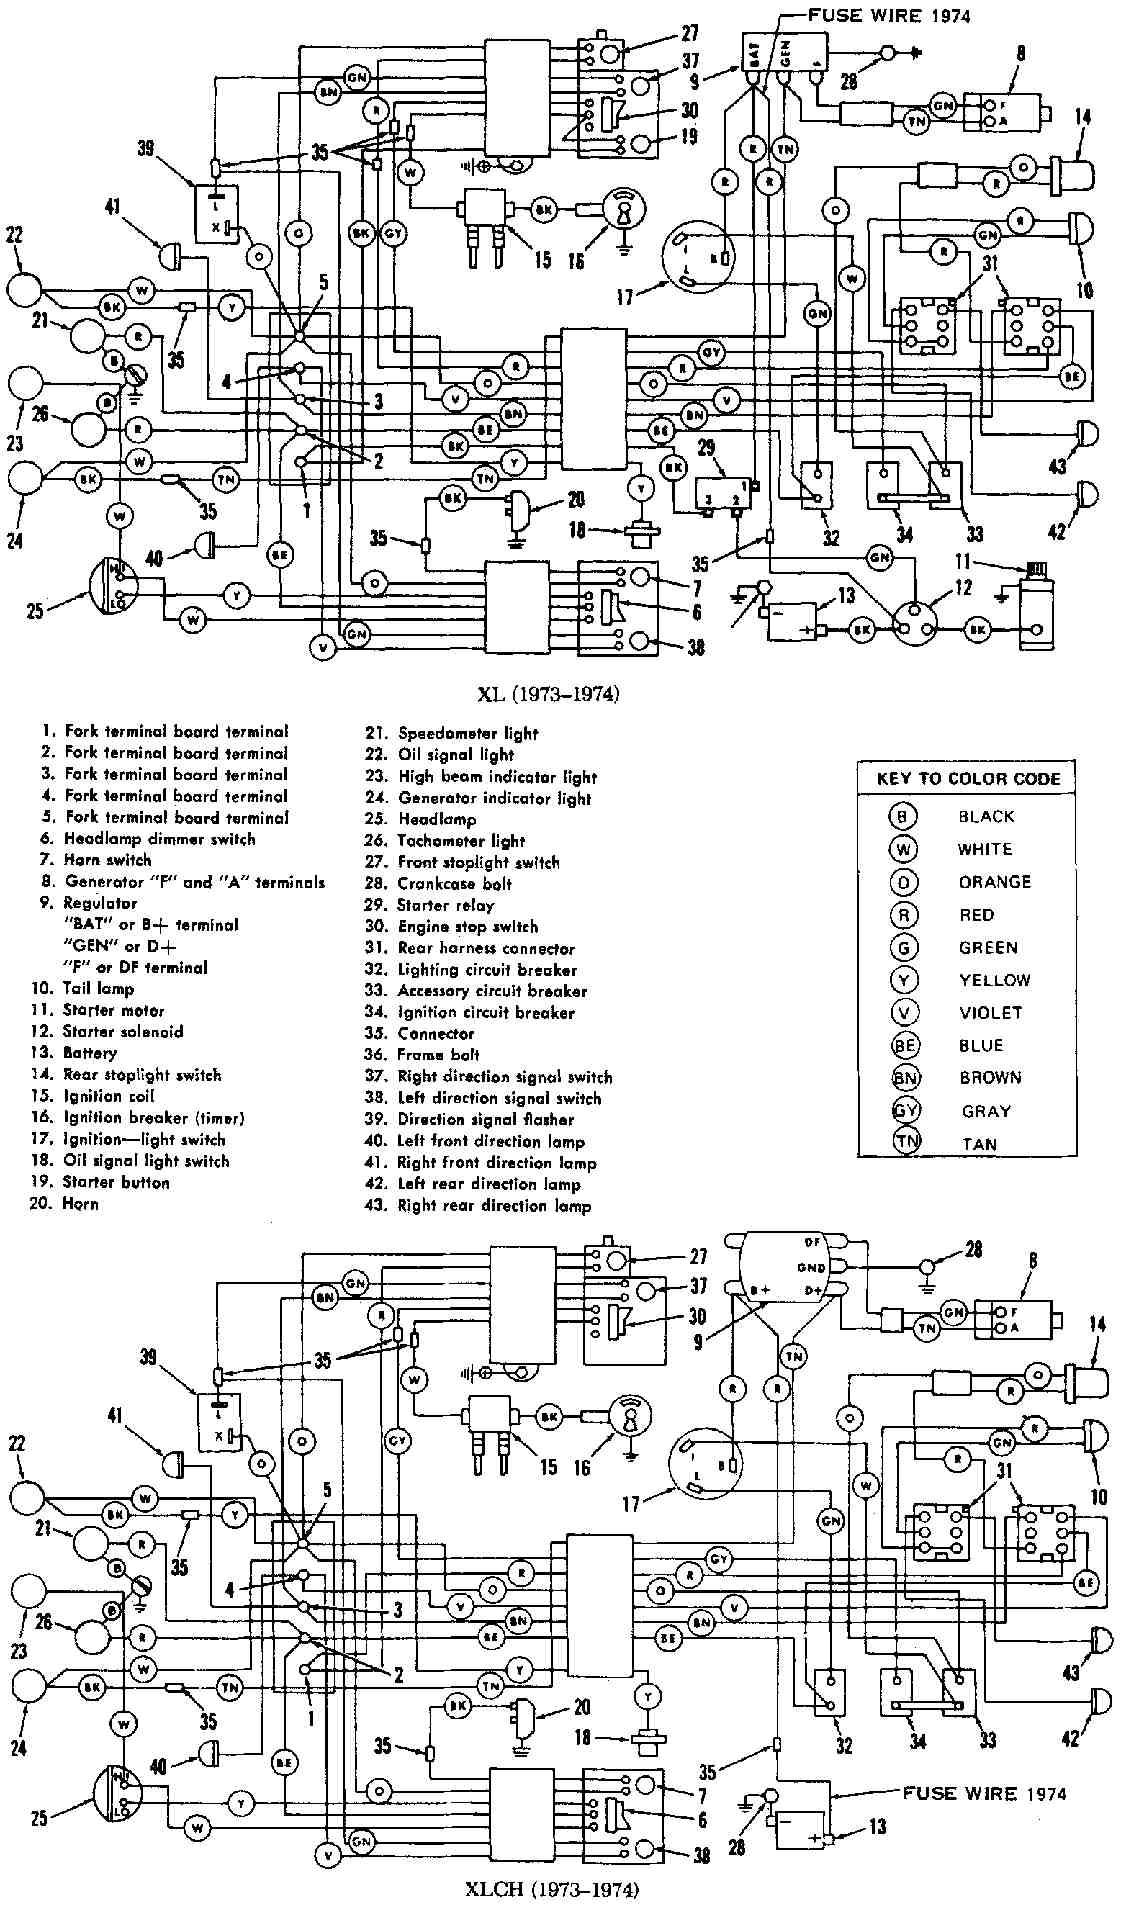 wiring diagram of toyota revo with Diagrams9291210 Jeep Wiring Diagram 1984 on Engine Rocker Arms Diagram in addition 1999 Toyota Corolla Ve 1zzfe Engine furthermore 89 Mitsubishi Montero Wiring Diagram moreover Toyota Hilux 1kd Ftv Wiring Diagram in addition Revo 2 5 Wiring Diagram.